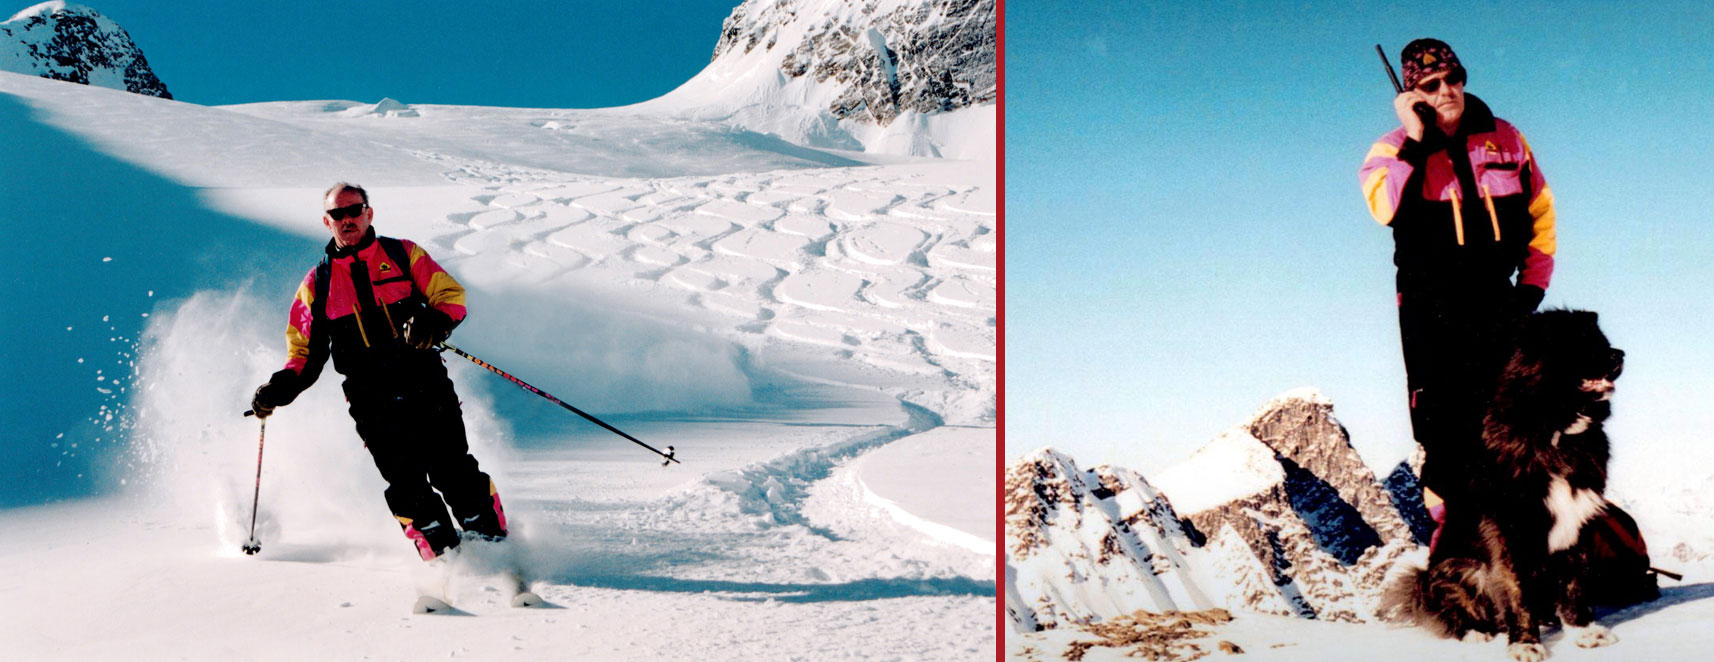 rk heliski founder Roger Madson skiing in deep powder